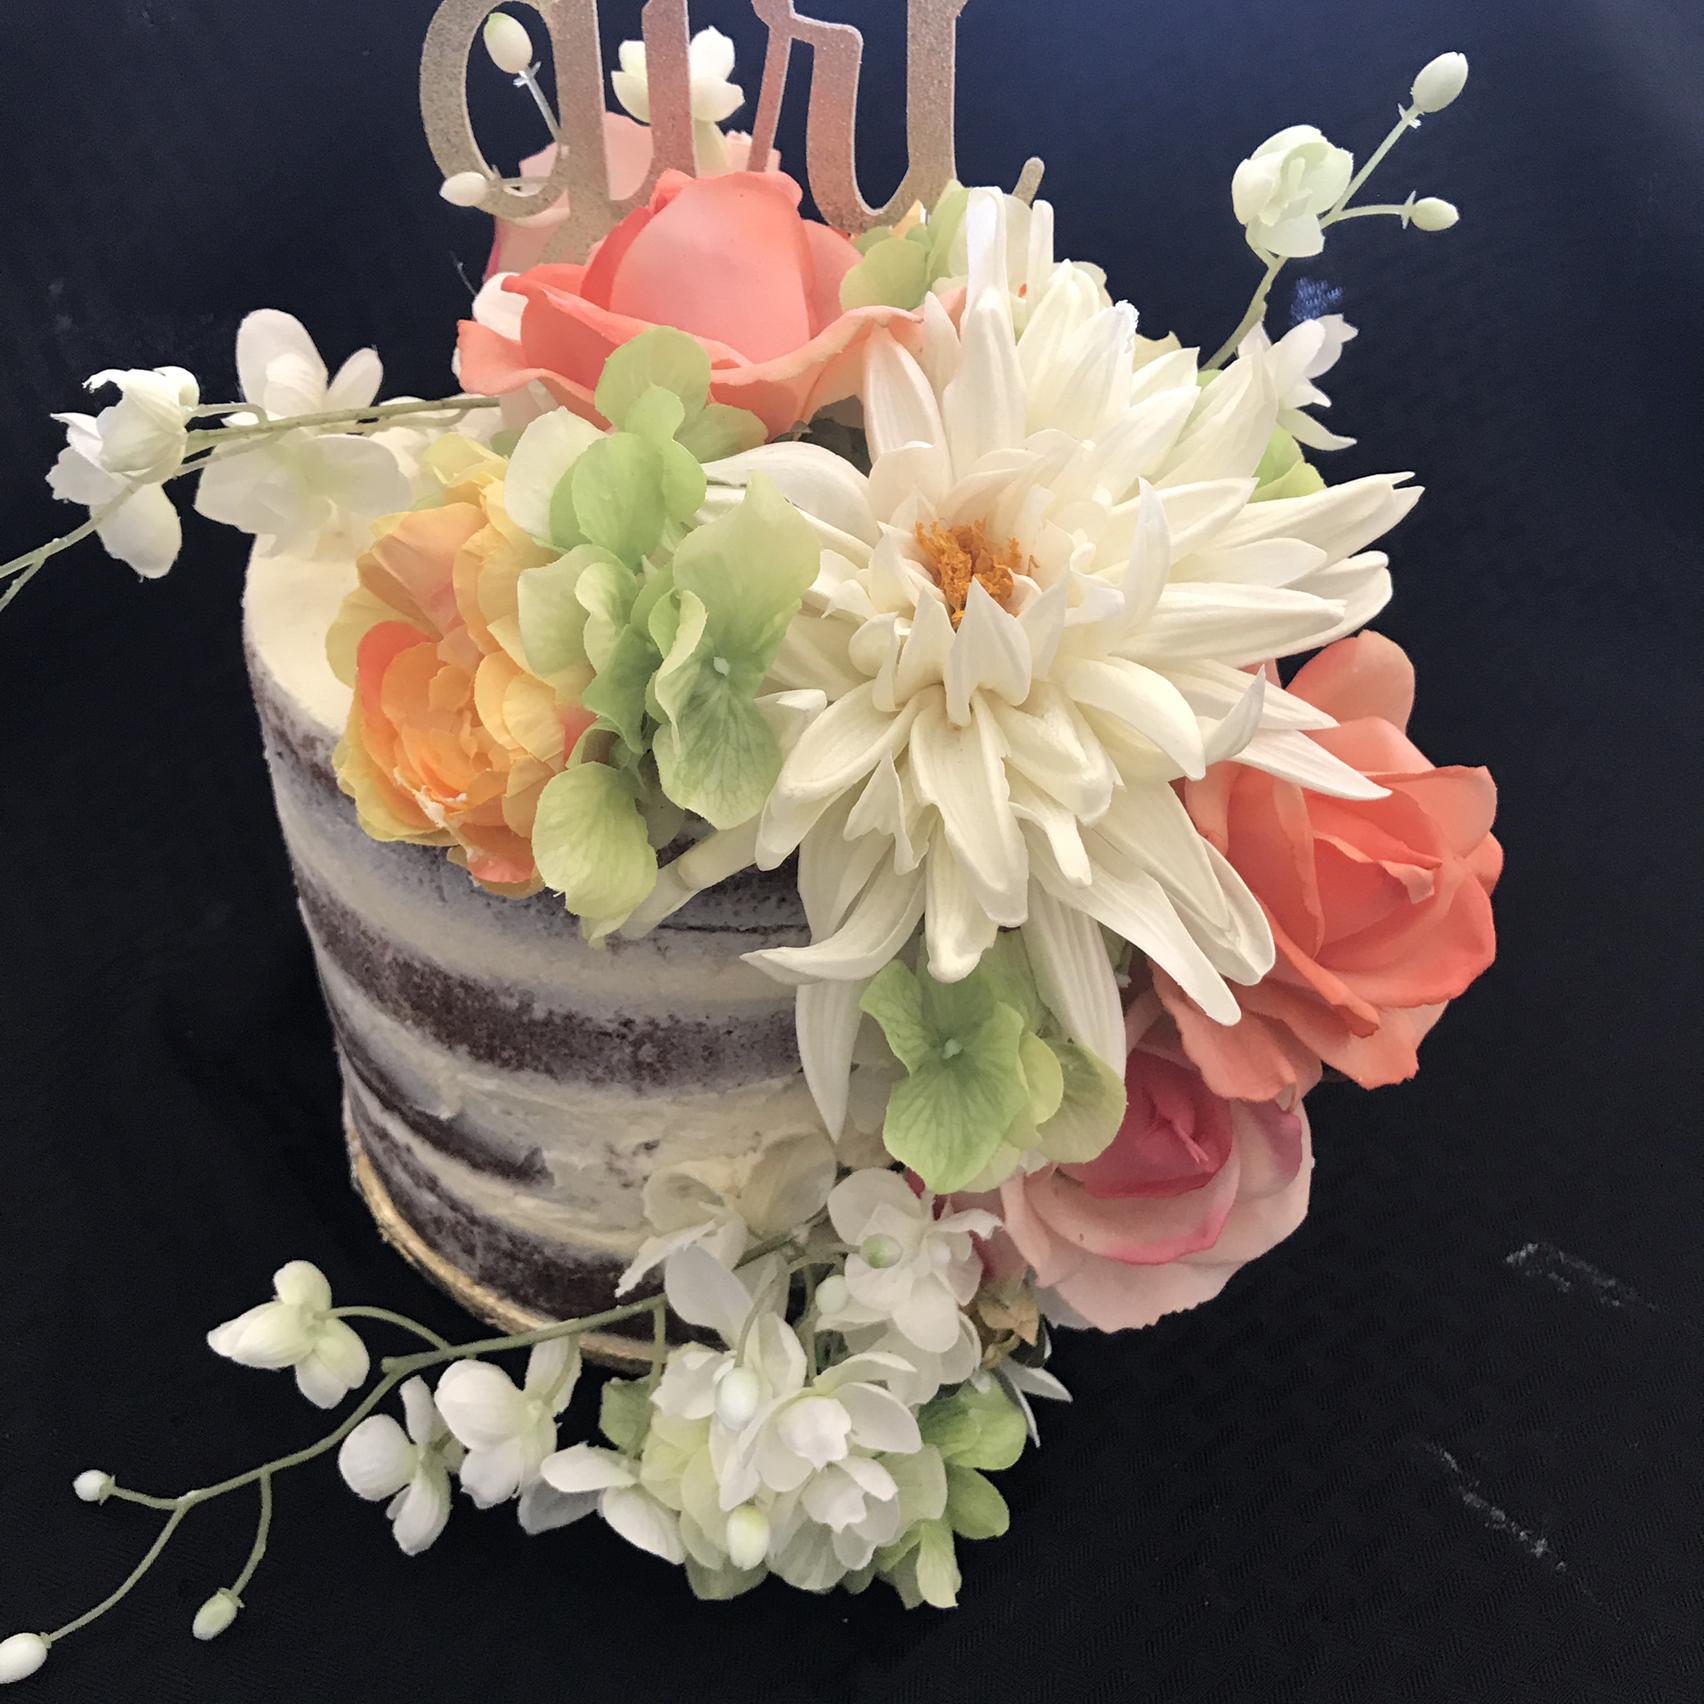 Champagne Cake With Buttercream Icing teena alihassan